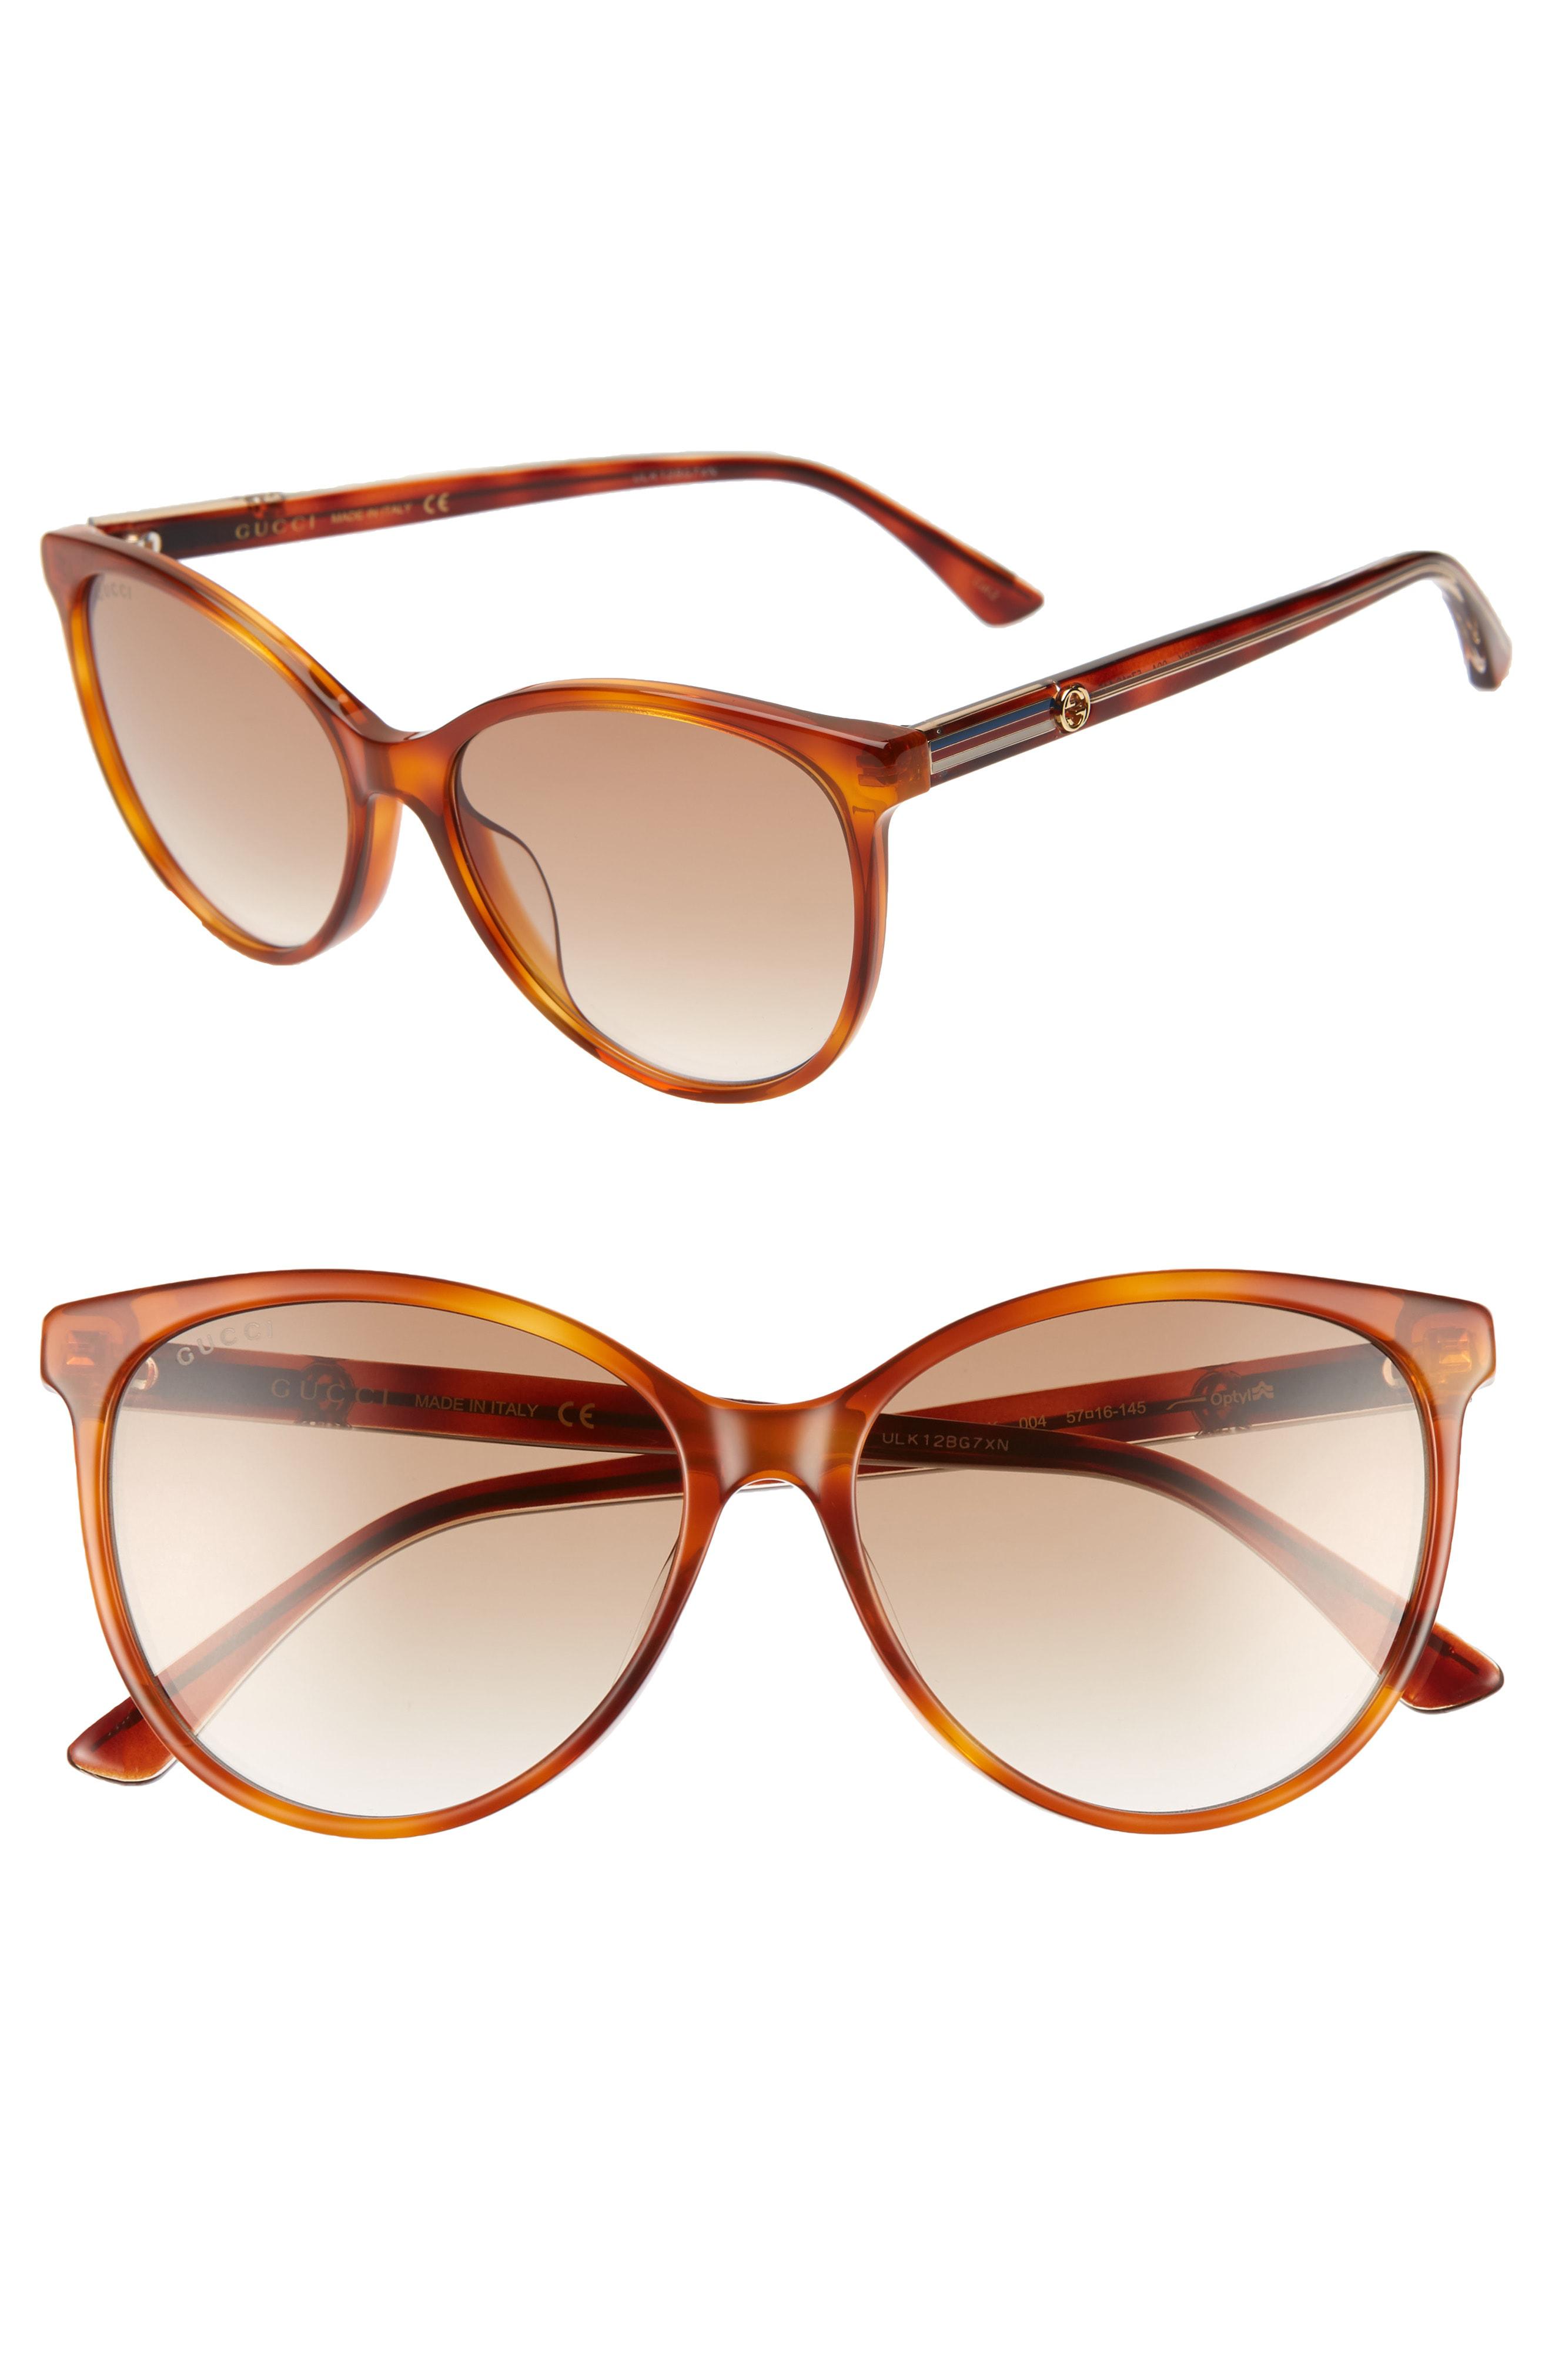 1dd1a1ee63 Gucci 57Mm Cat Eye Sunglasses - Blonde Havana  Borwn Gradient